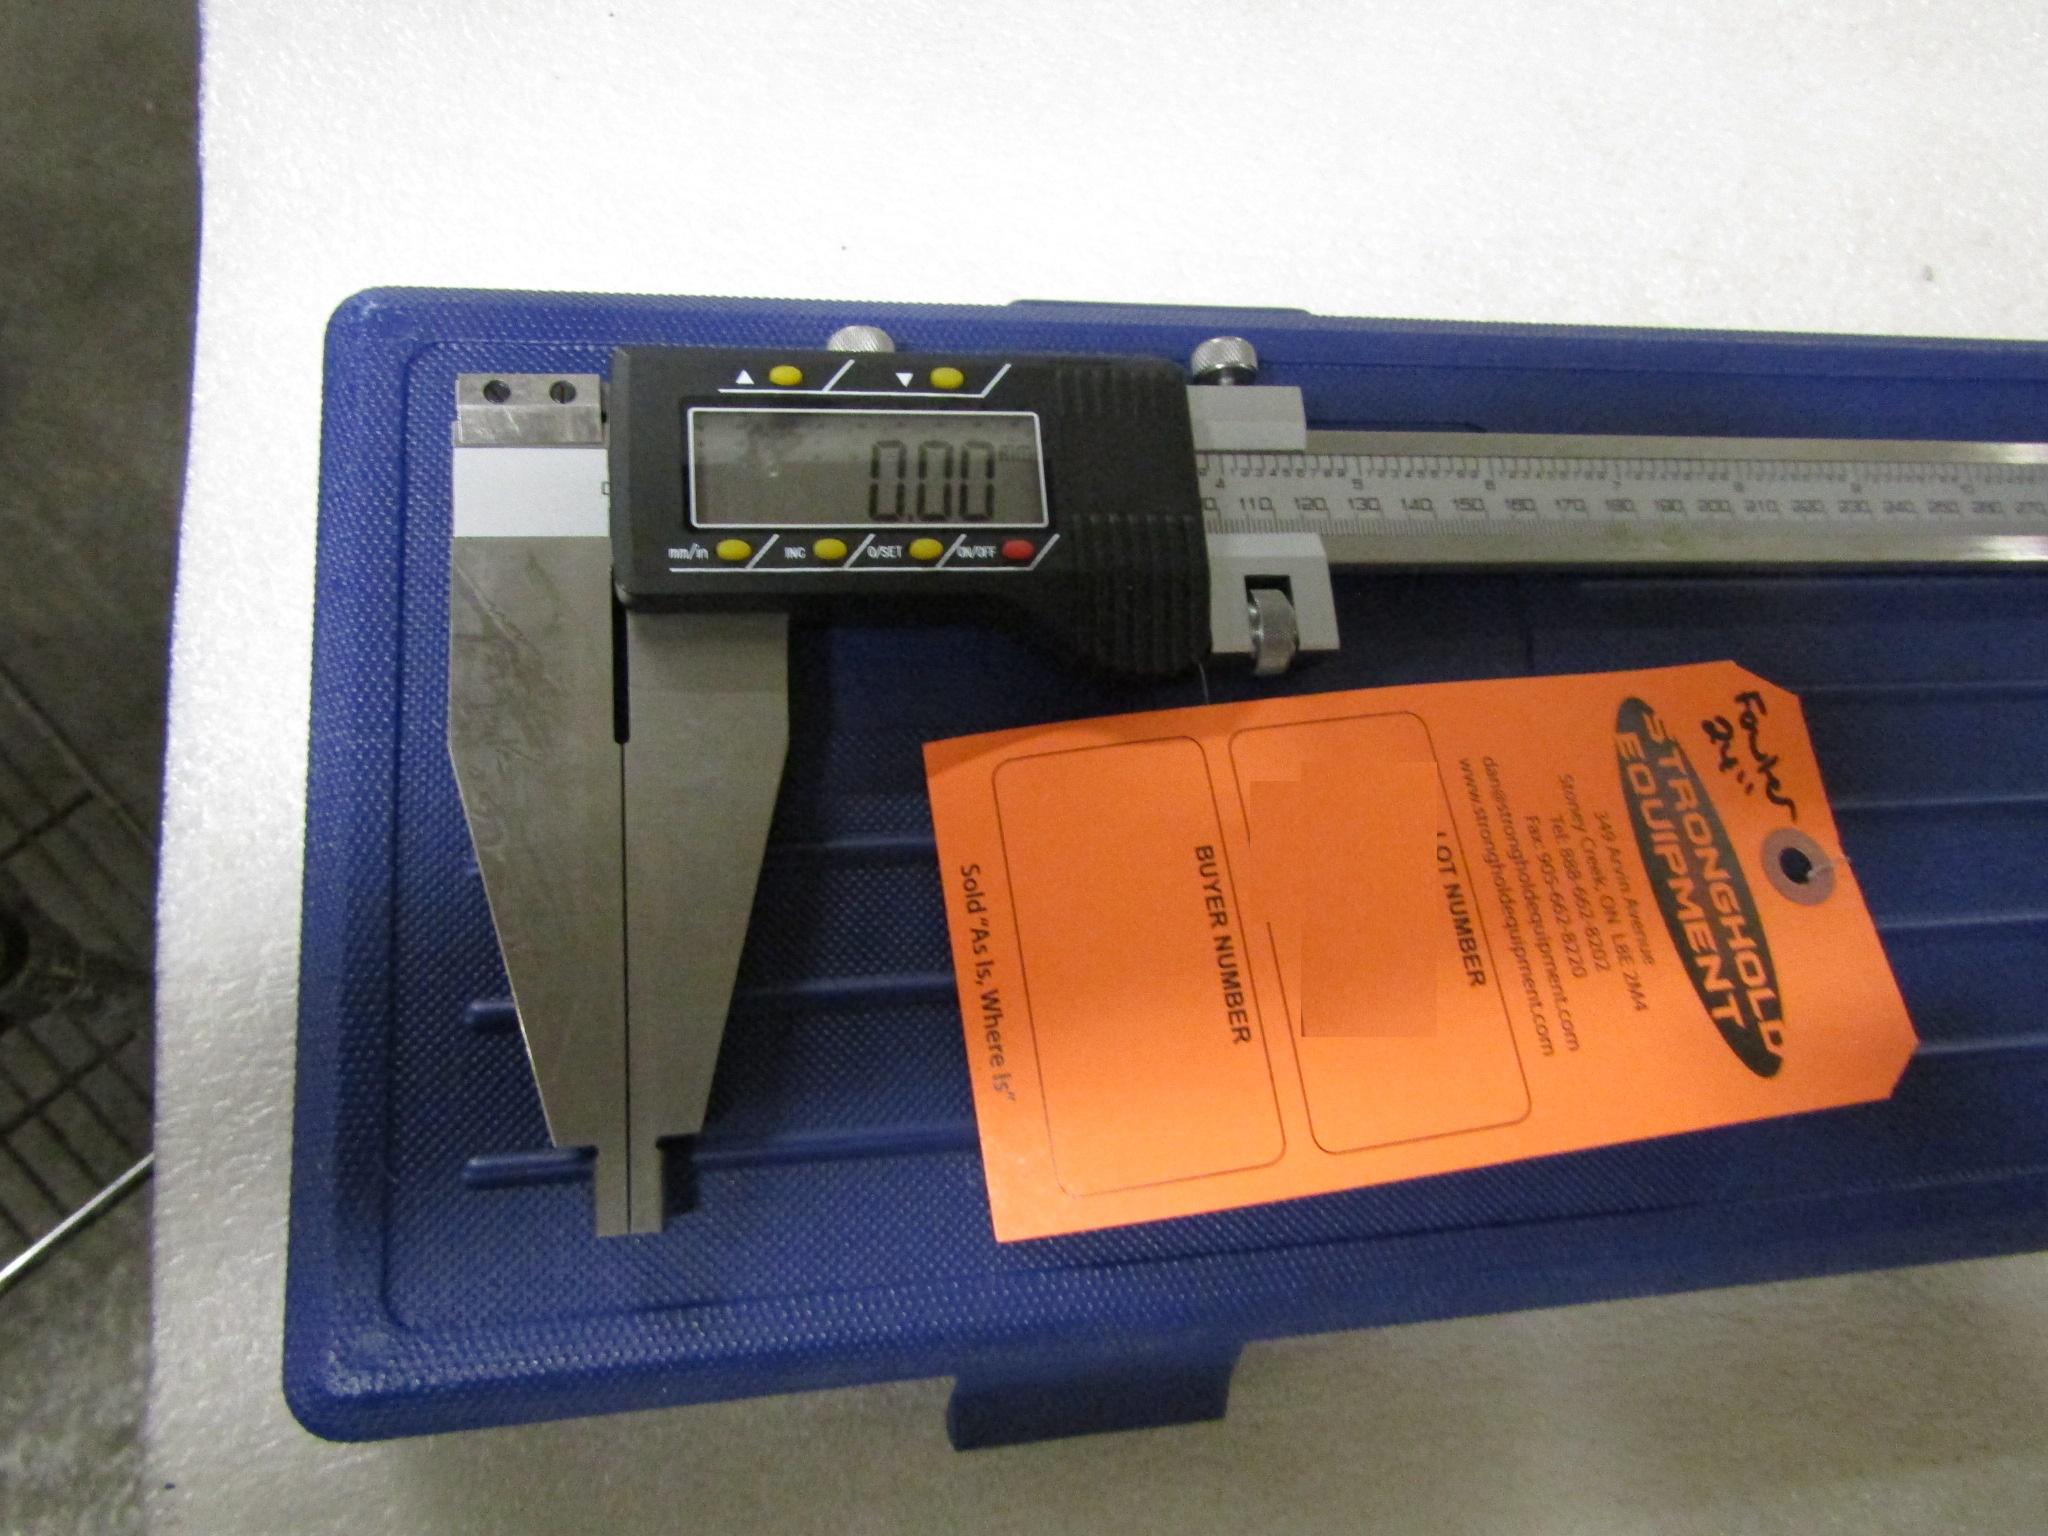 "Lot 48 - BRAND NEW Fowler 24"" / 600mm Digital Caliper - large digital readout display in case - MINT"